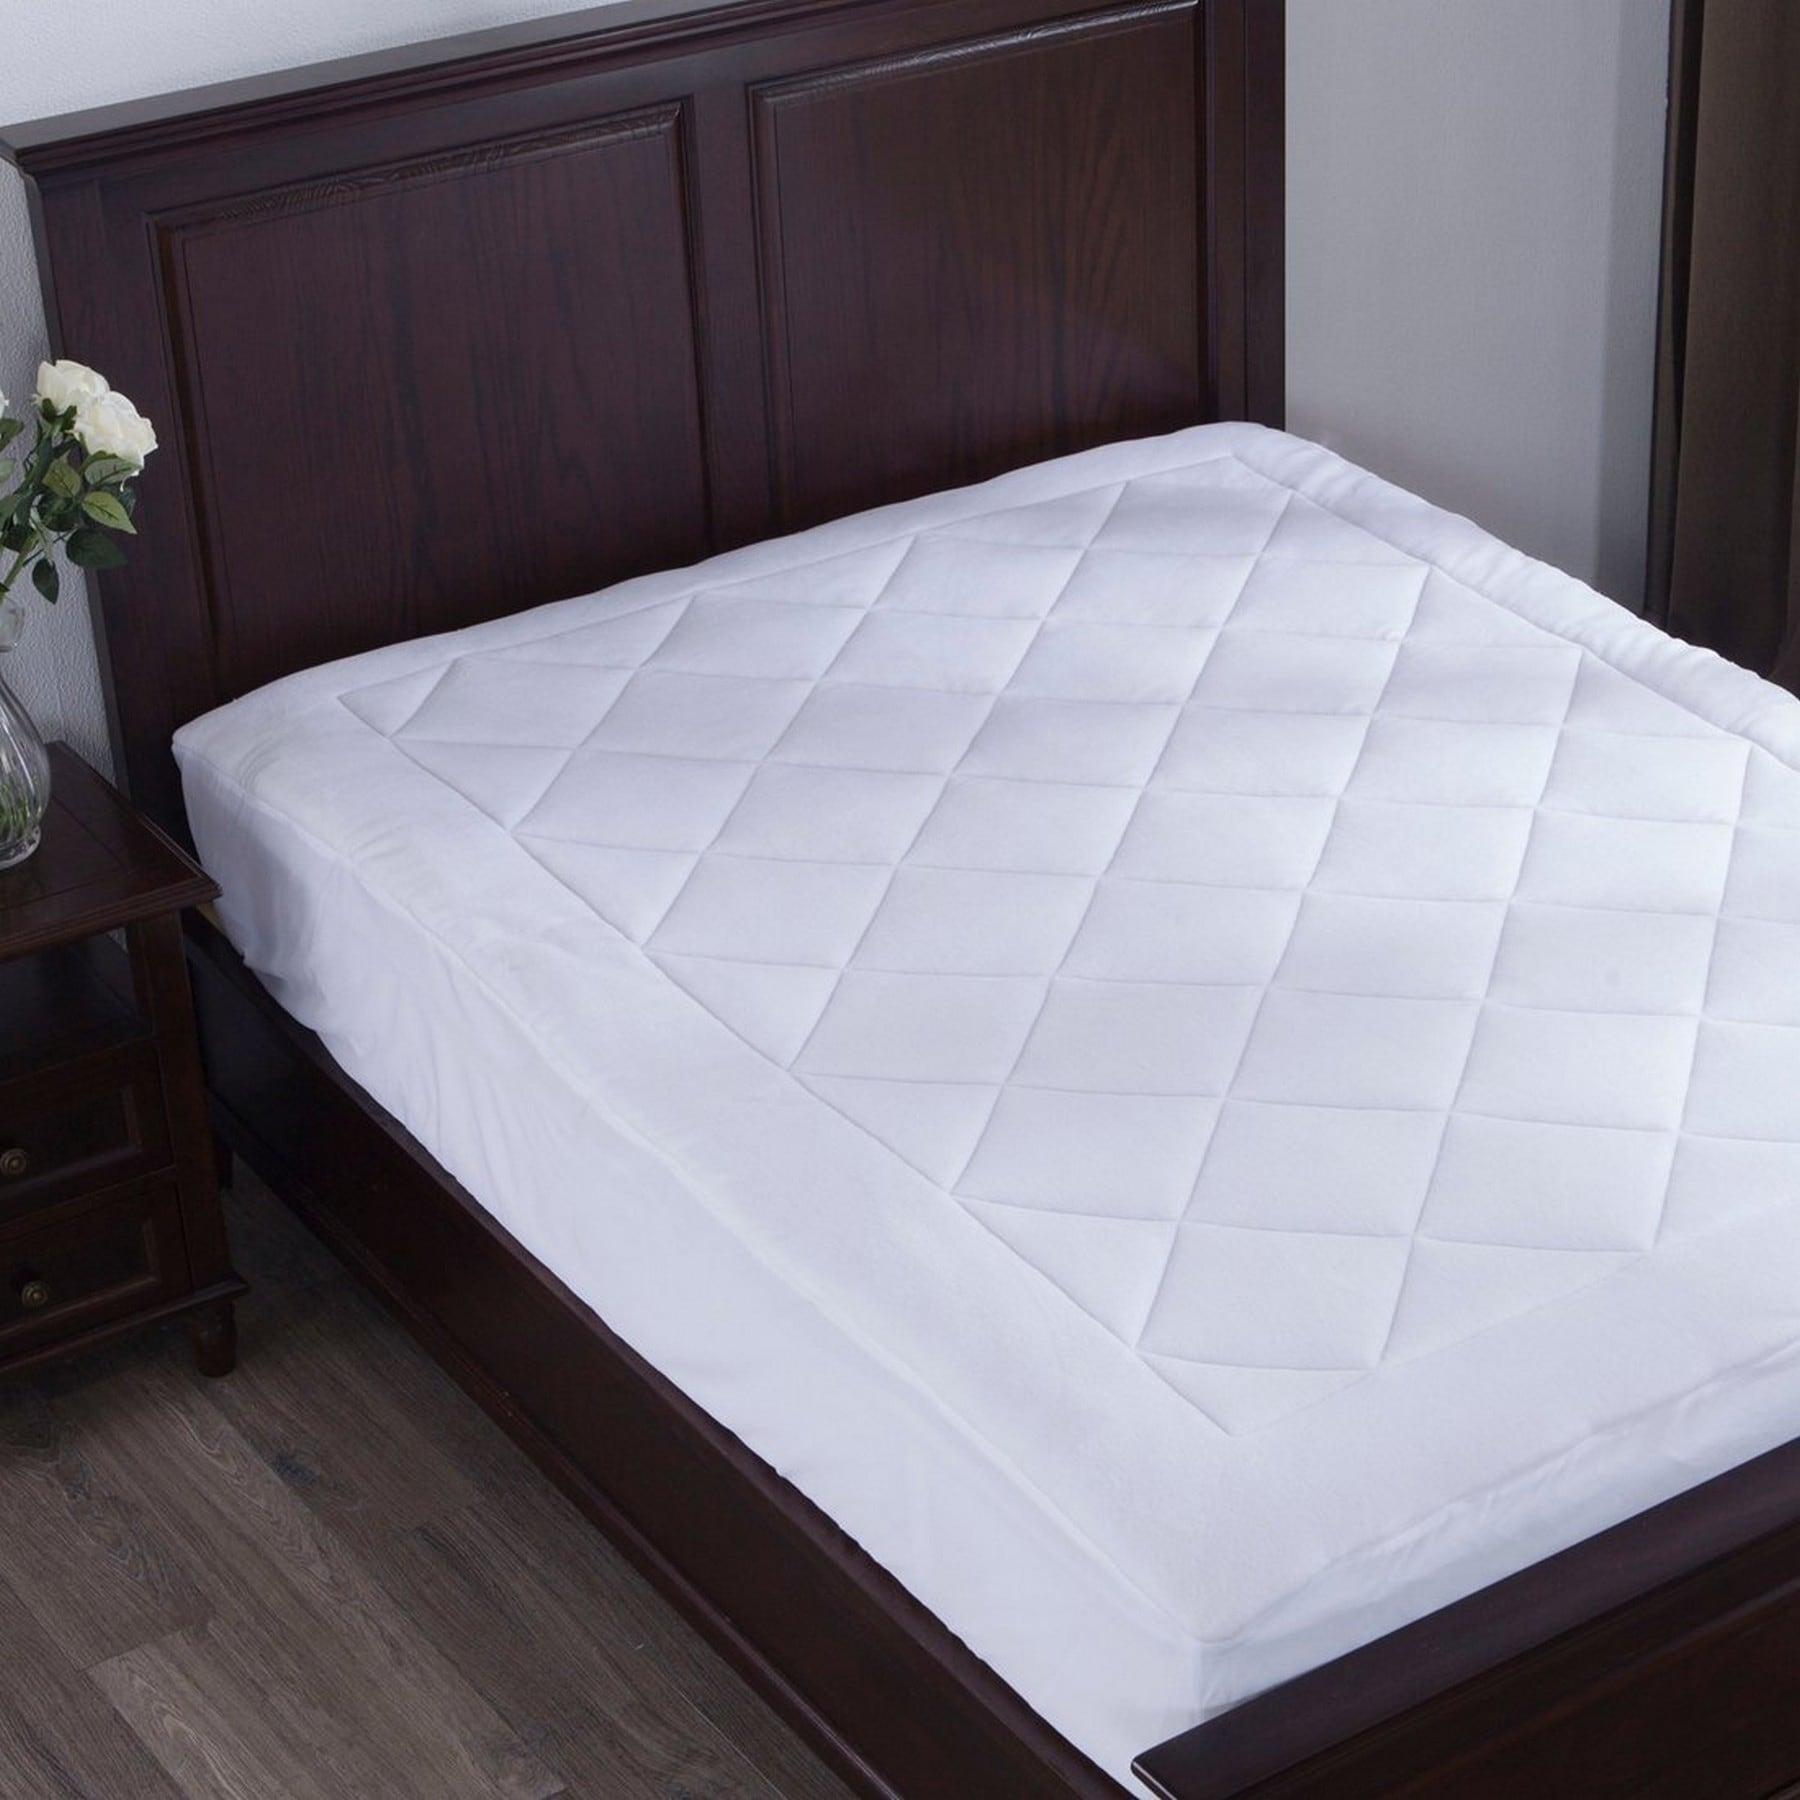 St. James Home Coral Fleece Mattress Pad - White (King) (...